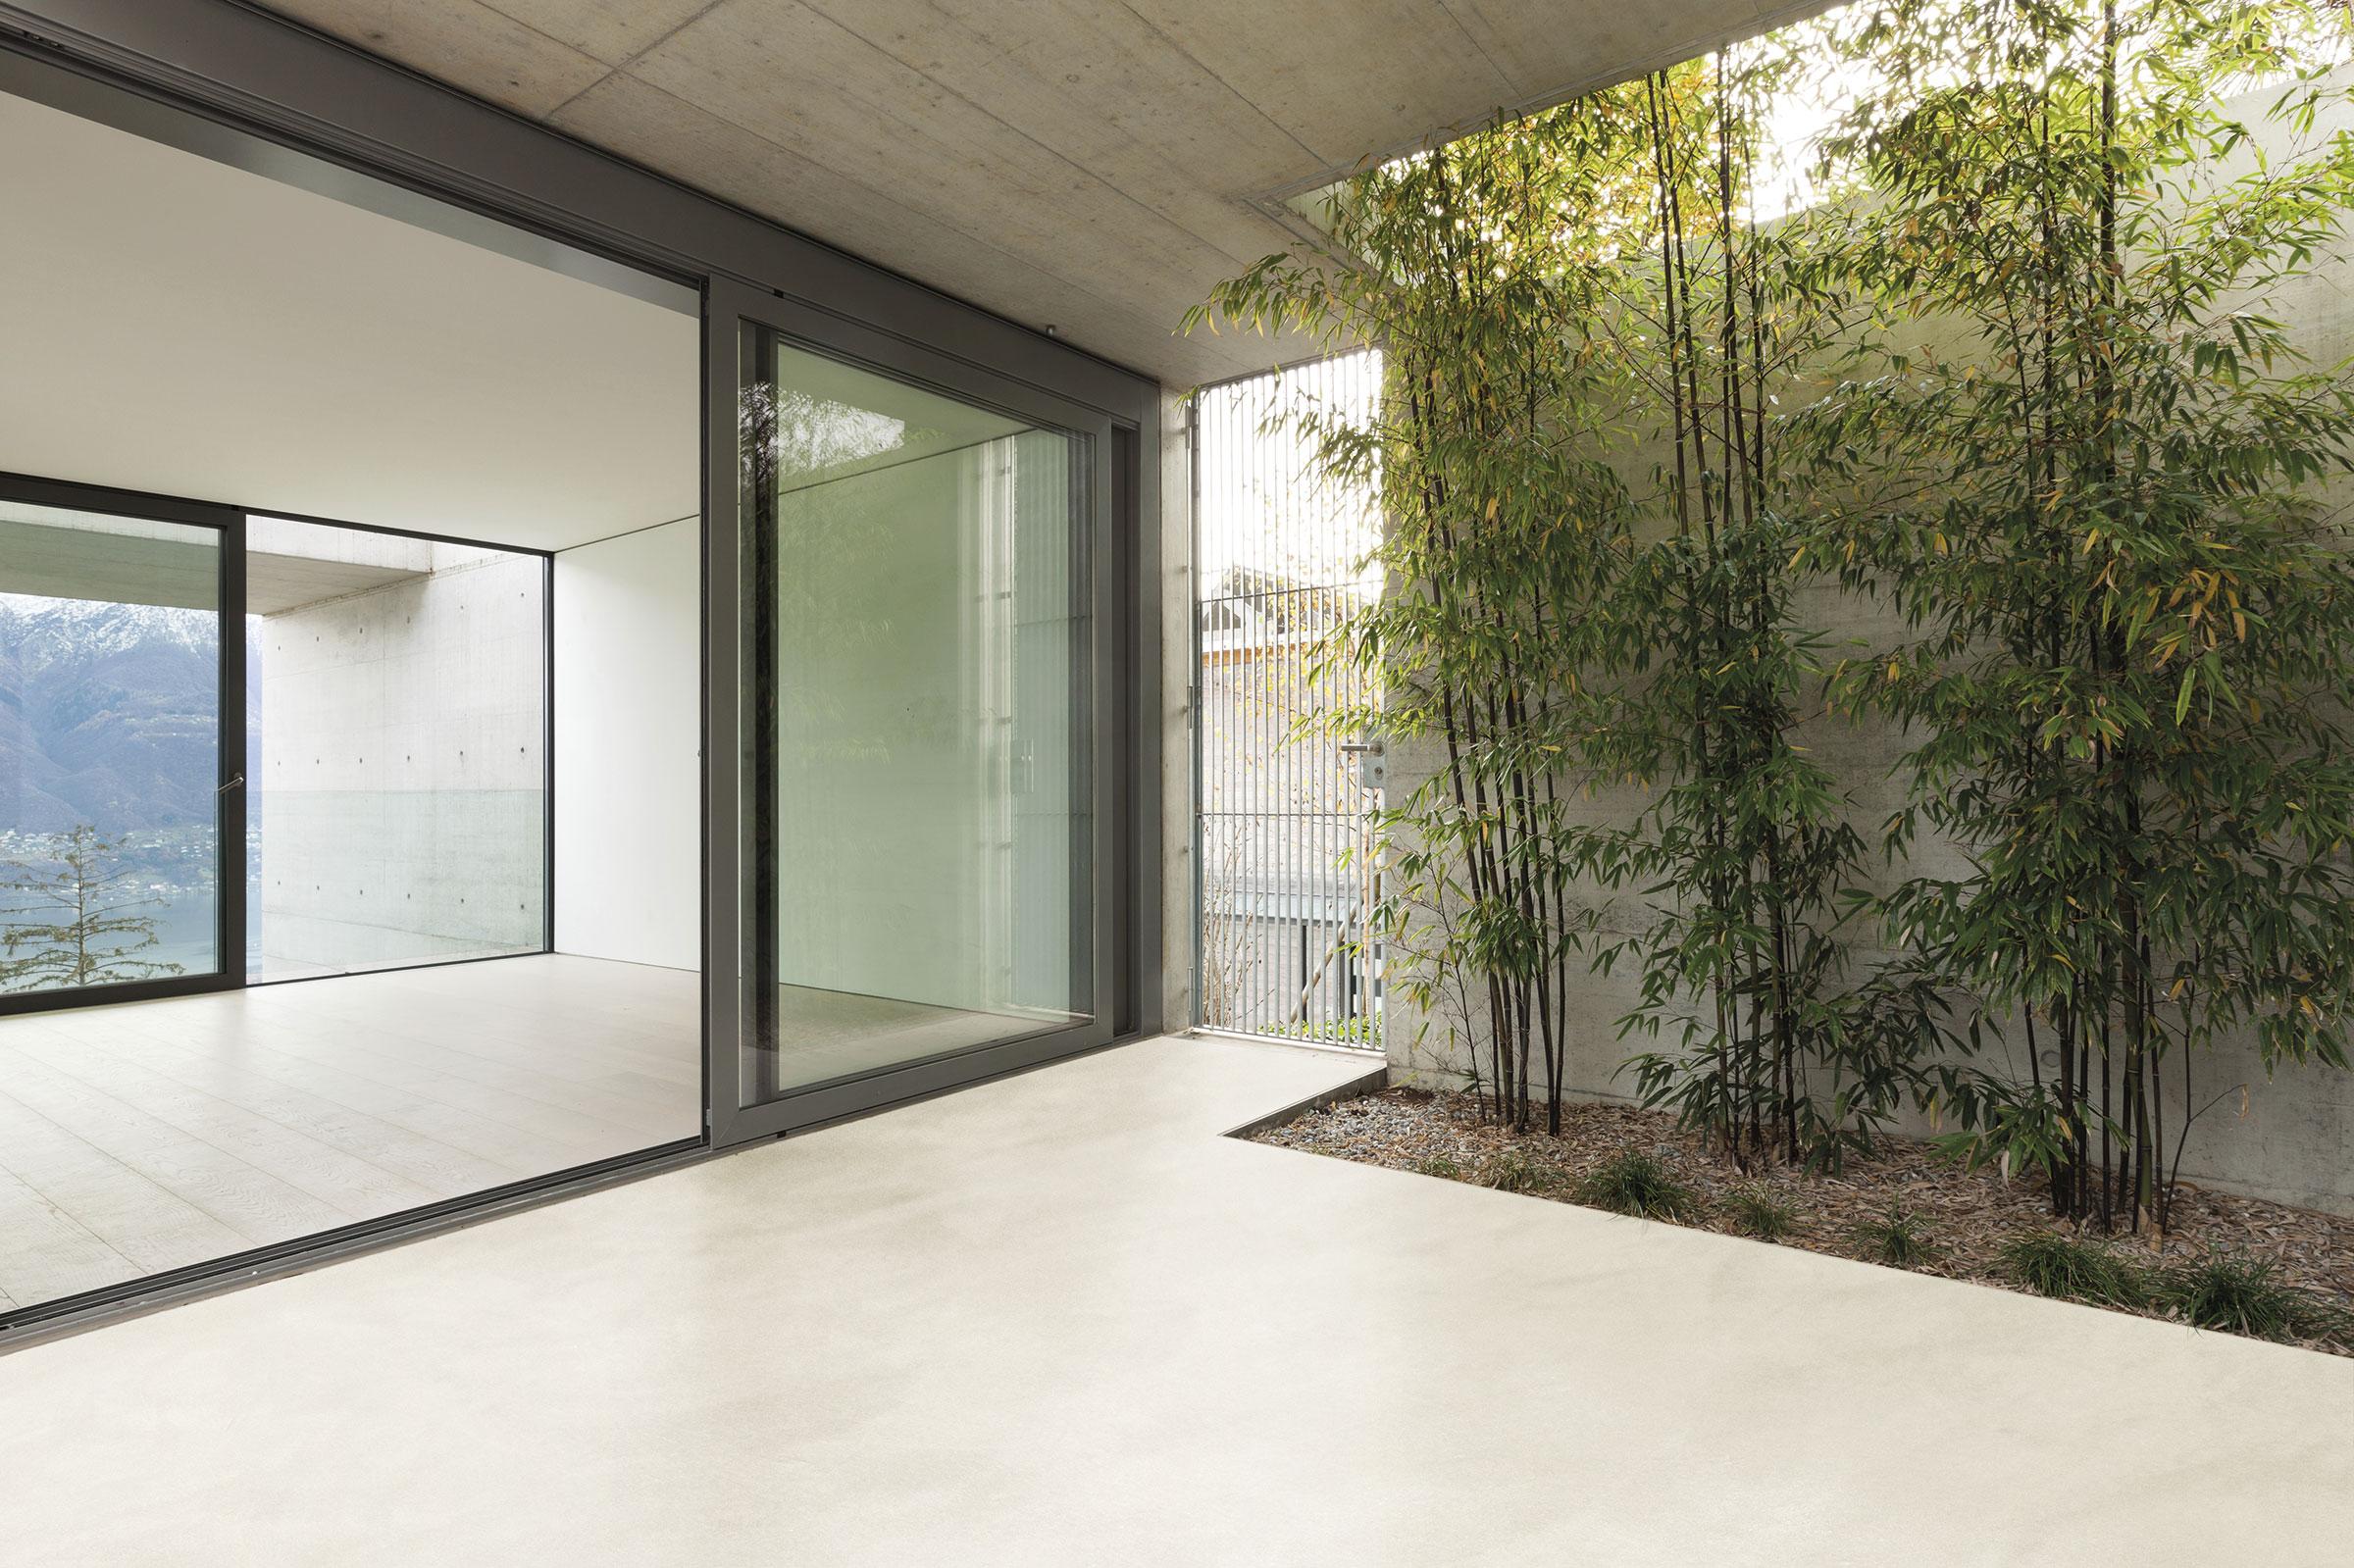 Resina Spatolato Outdoor - Esterni di Design - ErreLAB